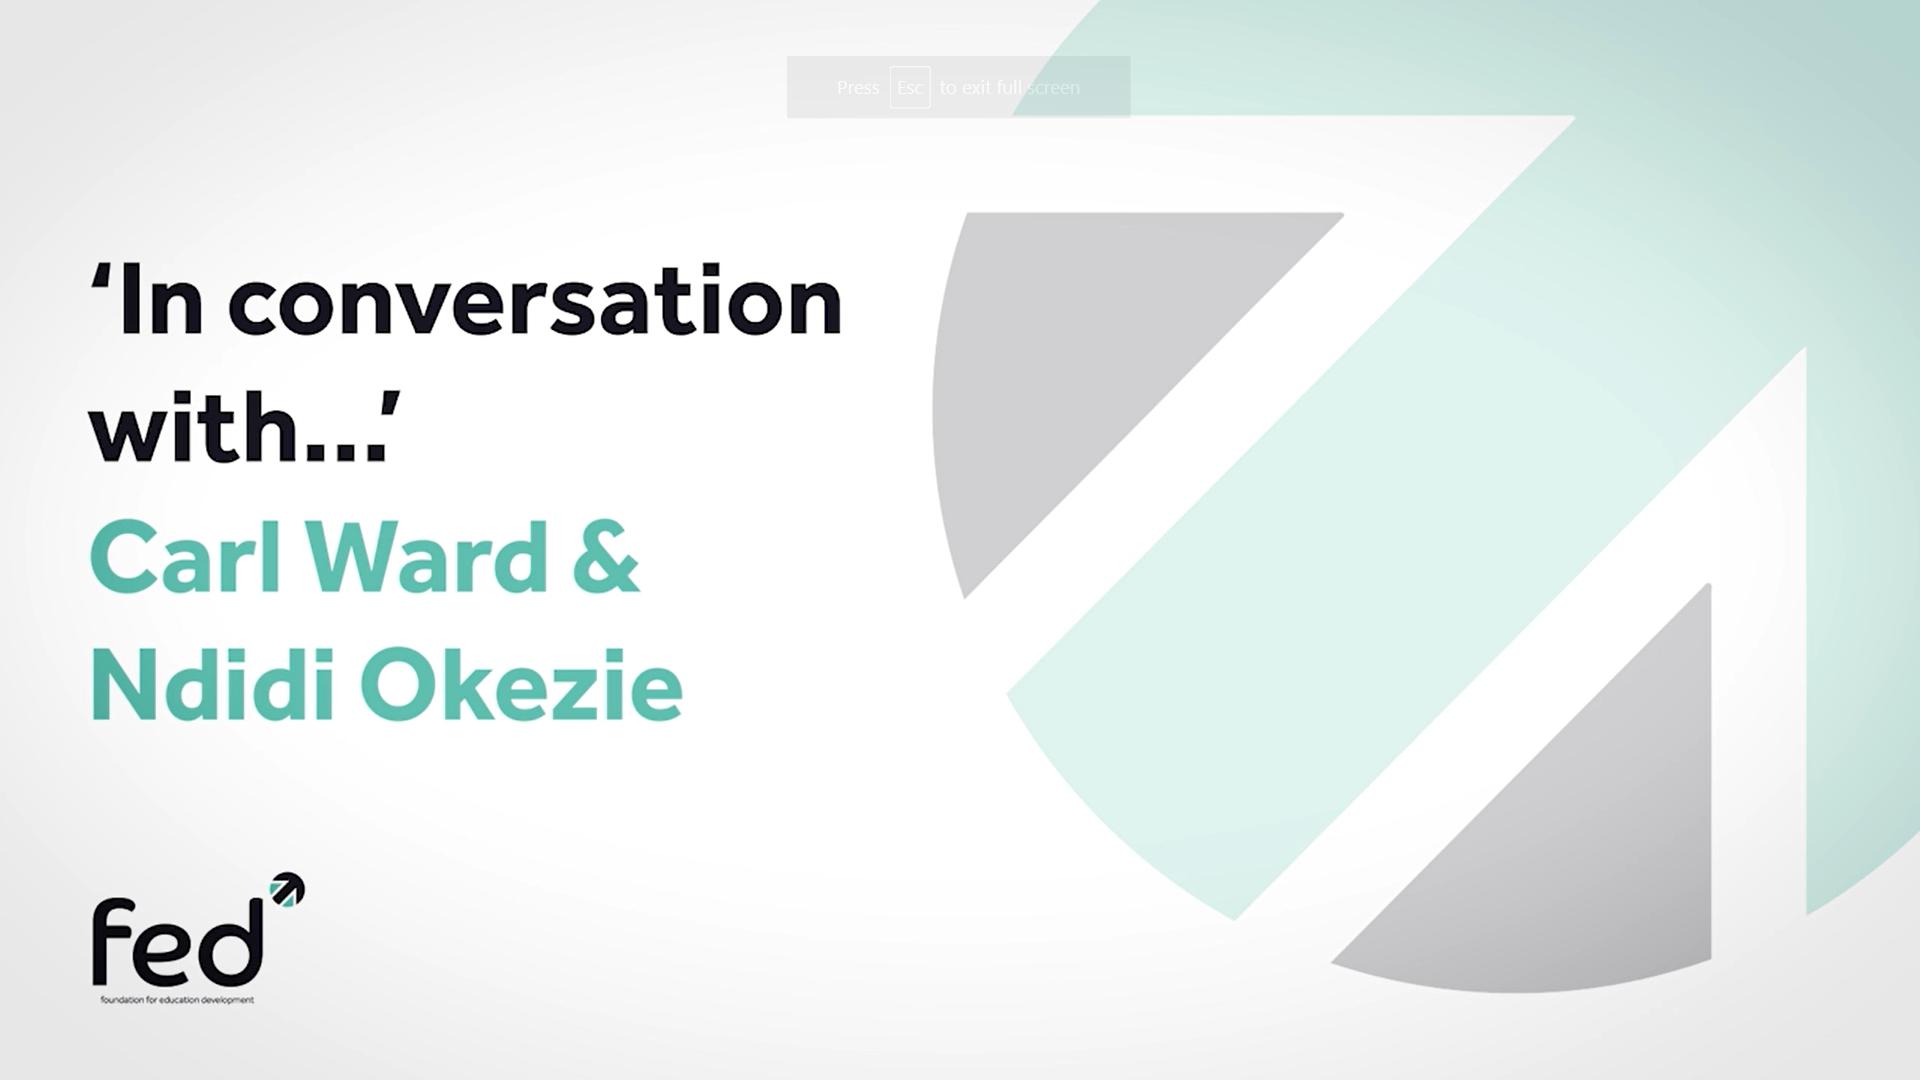 Ndidi Okezie 'In Conversation With' Carl Ward